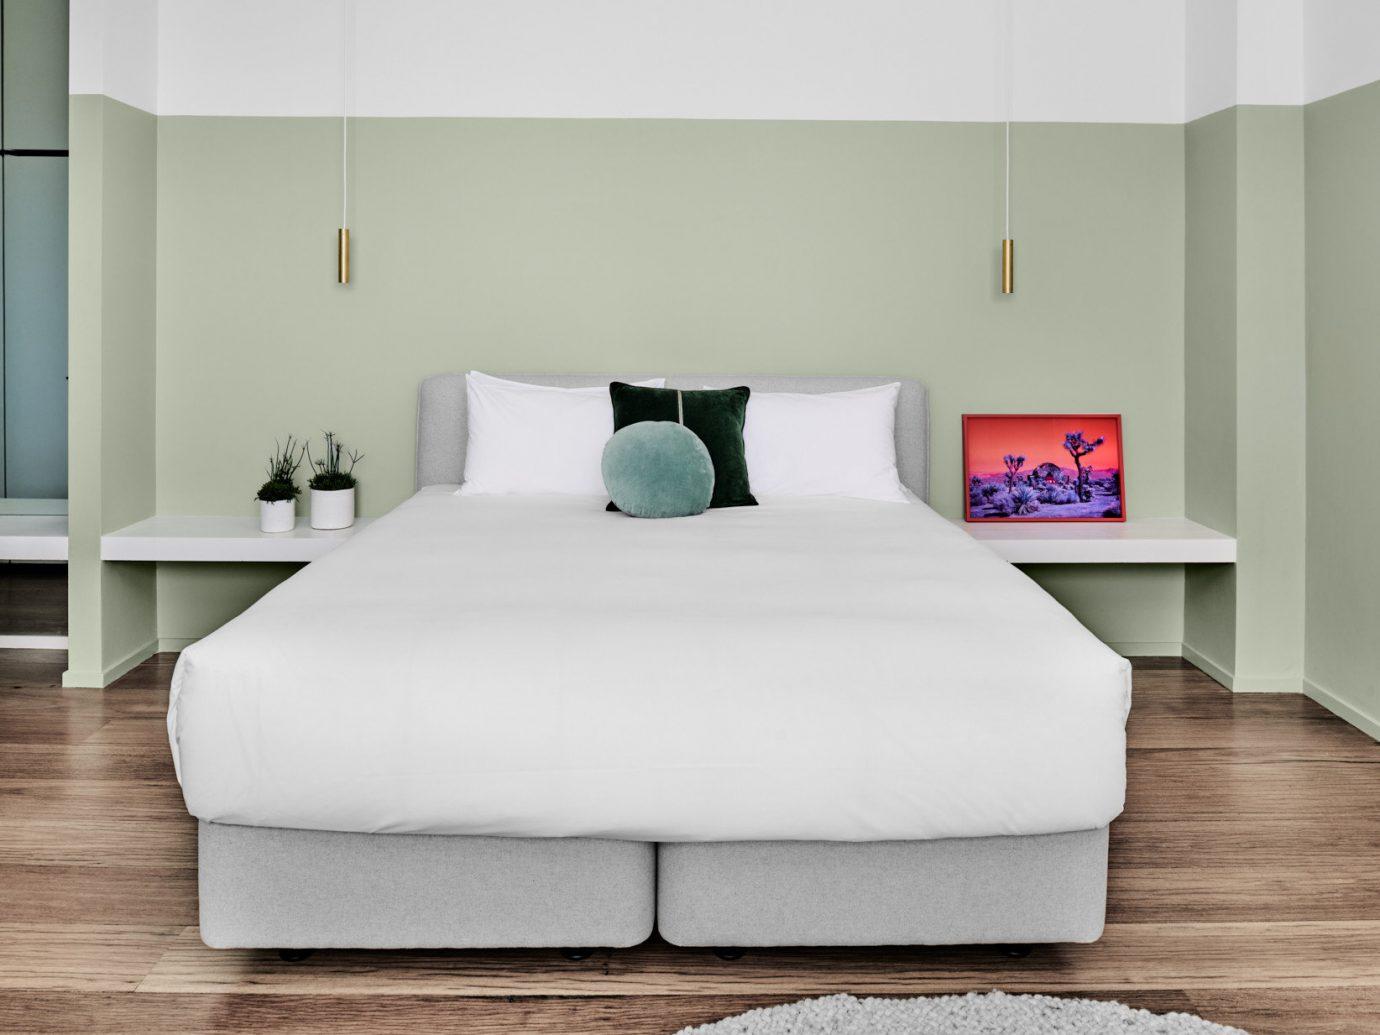 Australia Hotels Melbourne wall indoor floor bed frame room furniture bed mattress Bedroom interior design bed sheet Suite white home pillow bedding product design comfort mattress pad product interior designer duvet cover